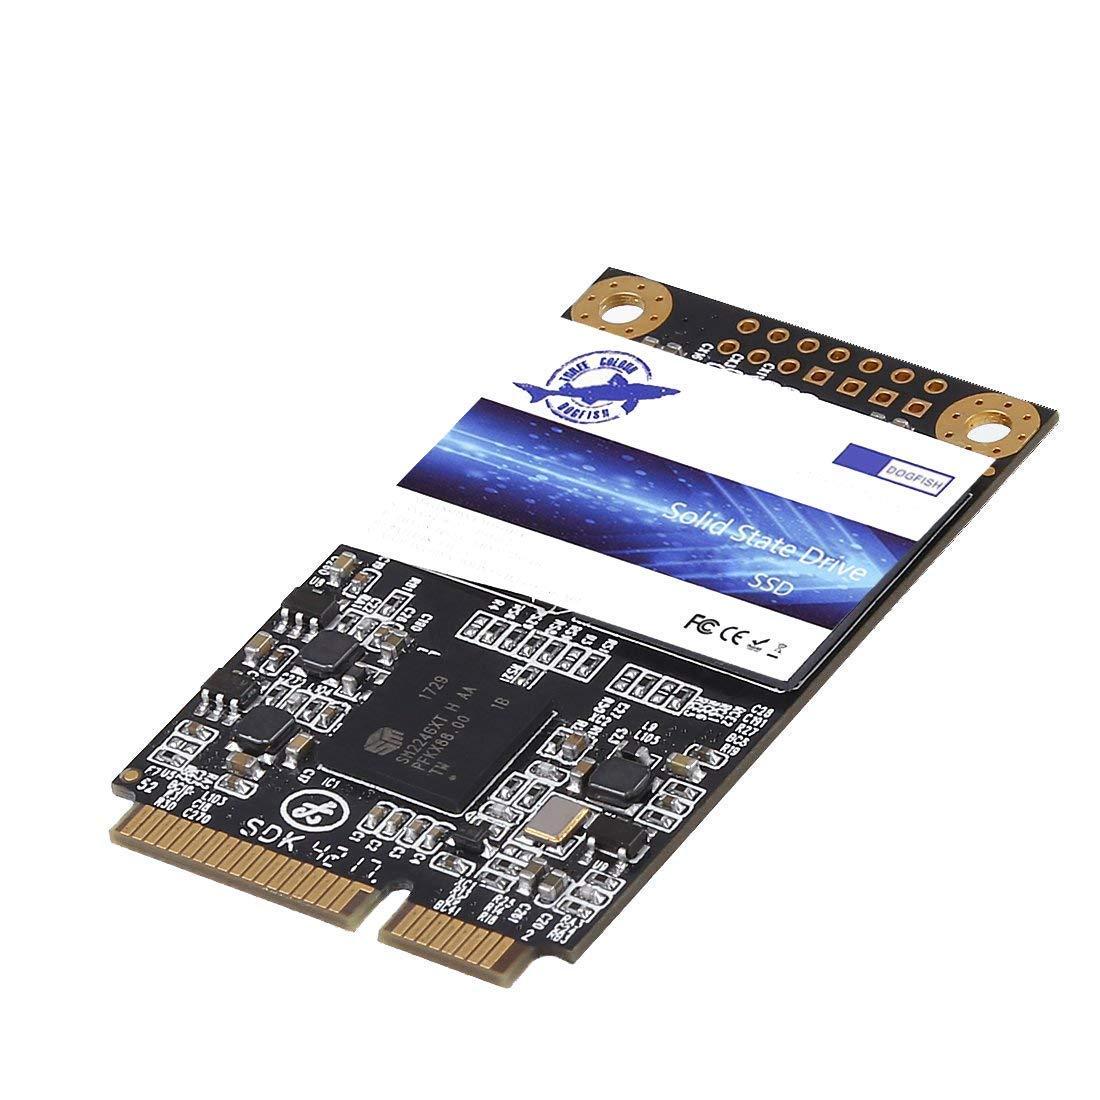 240GB SSD mSATA DOGFISH